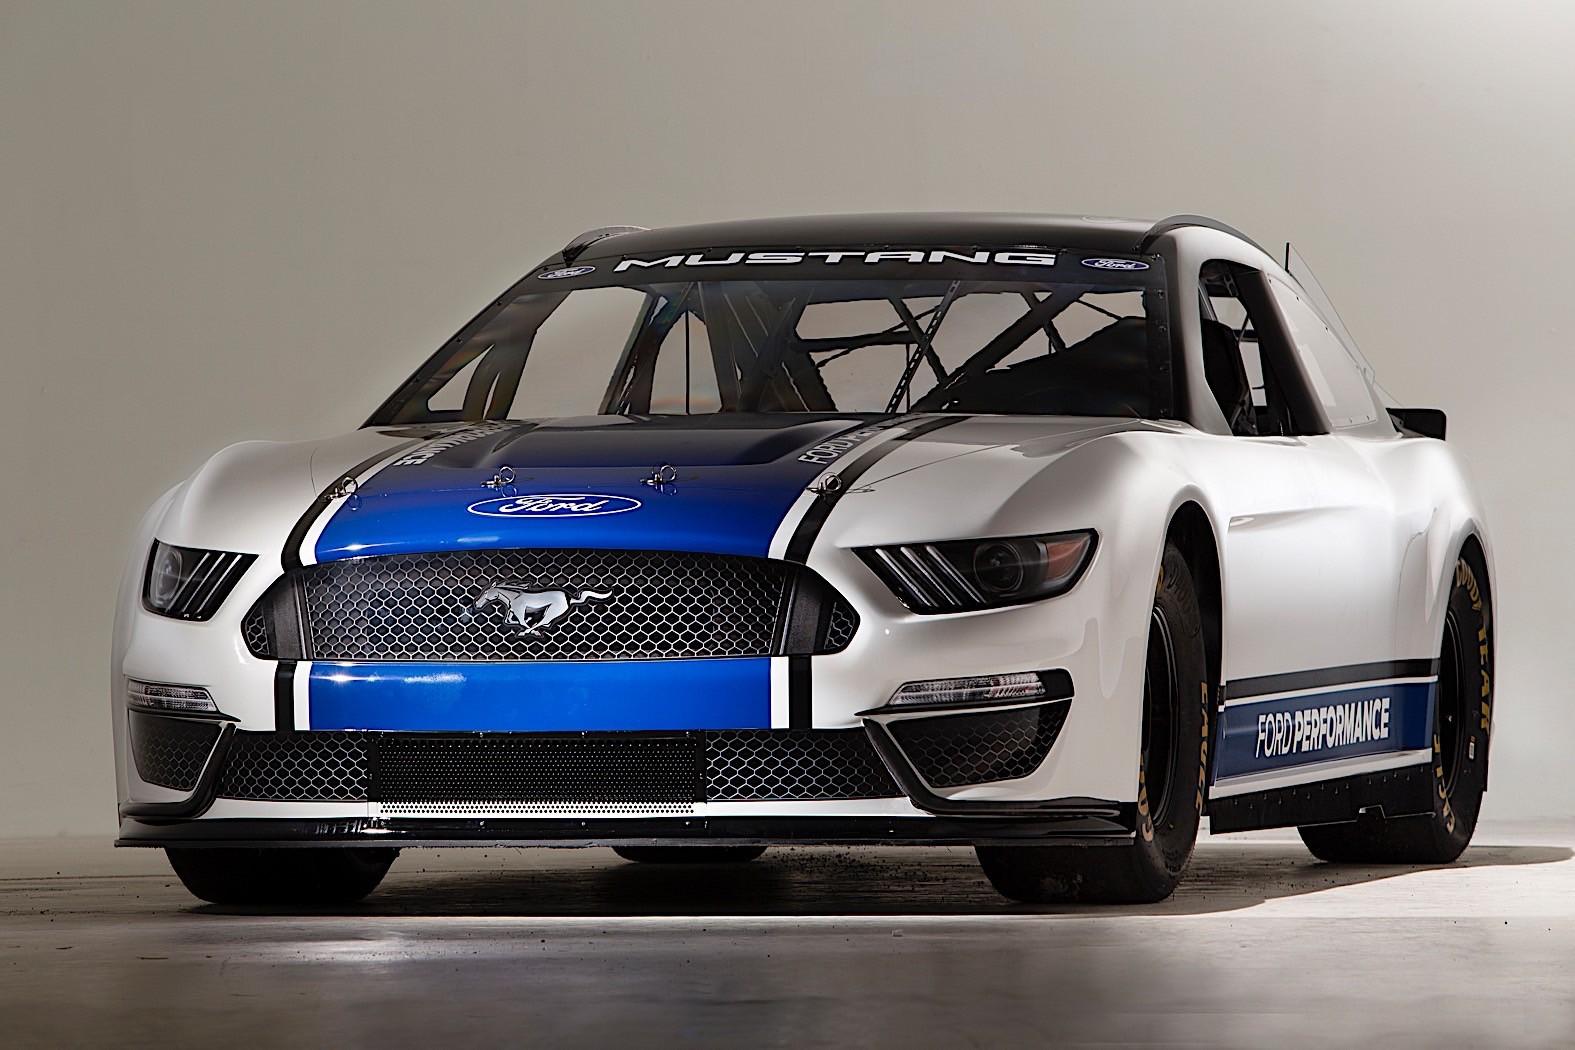 Nascar Cup Mustang